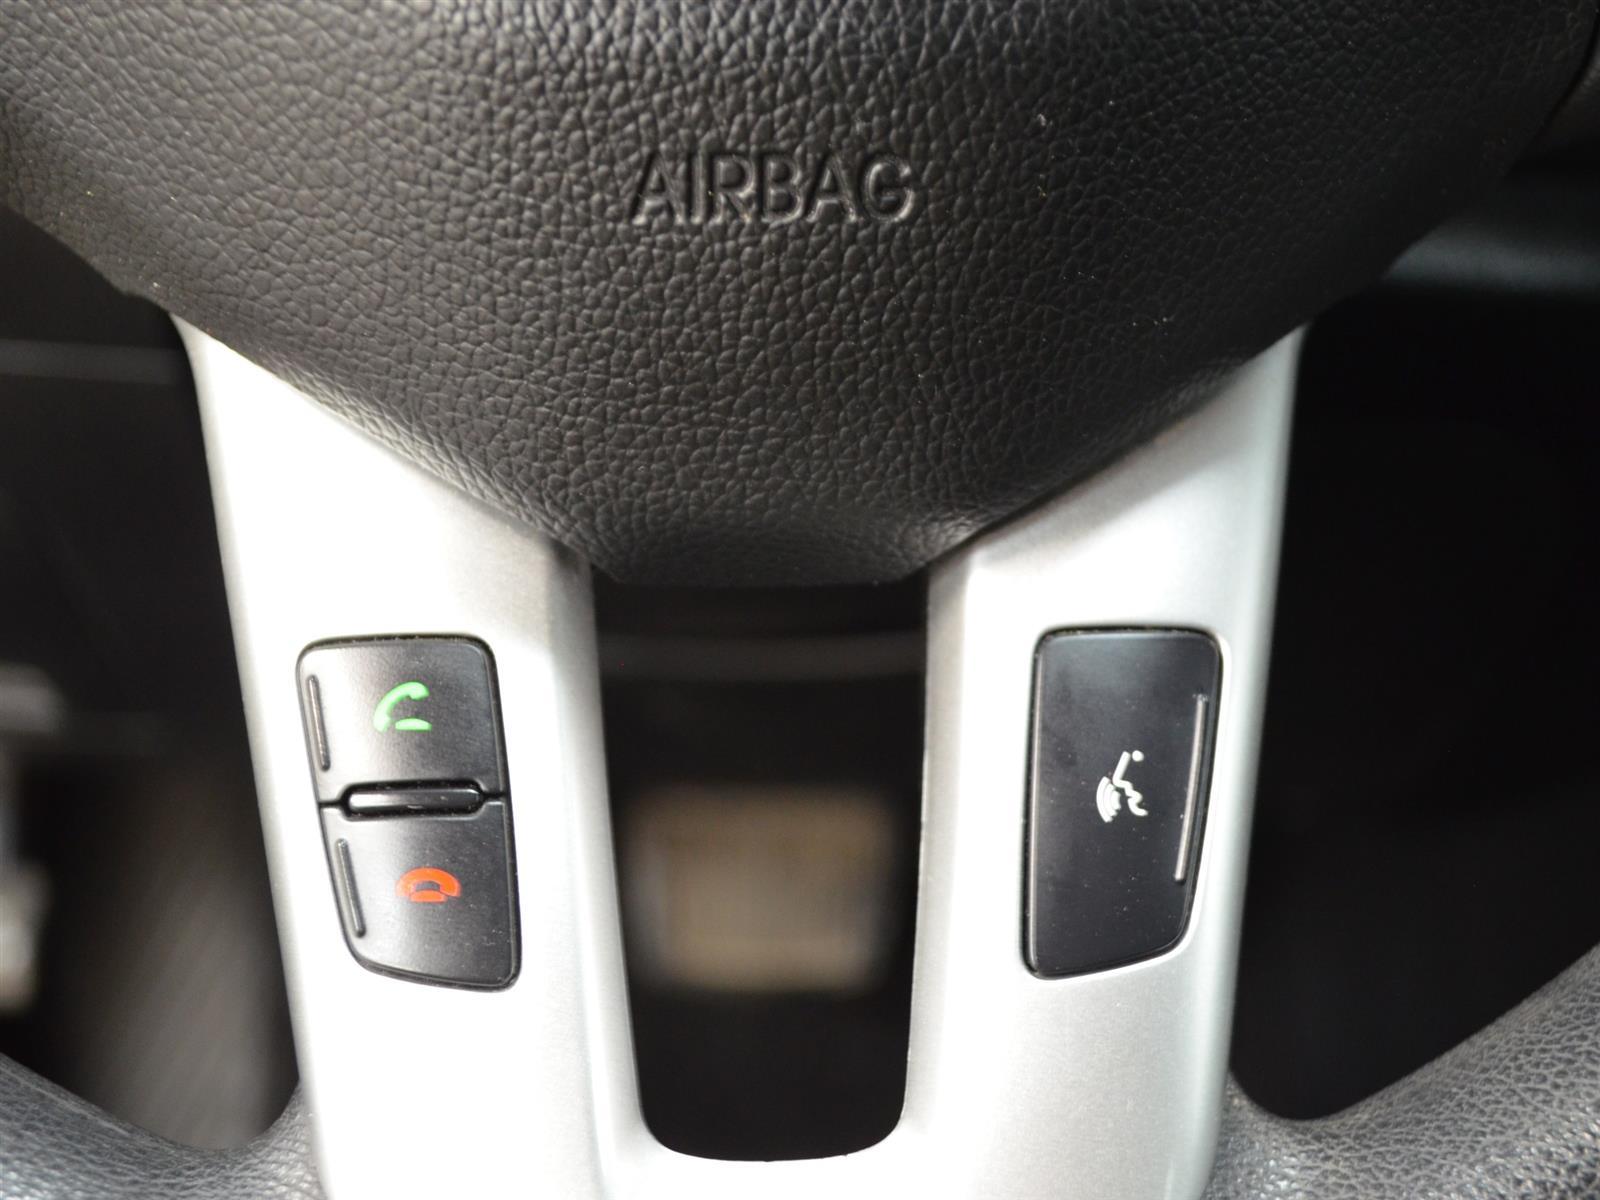 2013 Kia Sportage LX - BLUETOOTH * HEATED SEATS * SAT RADIO READY